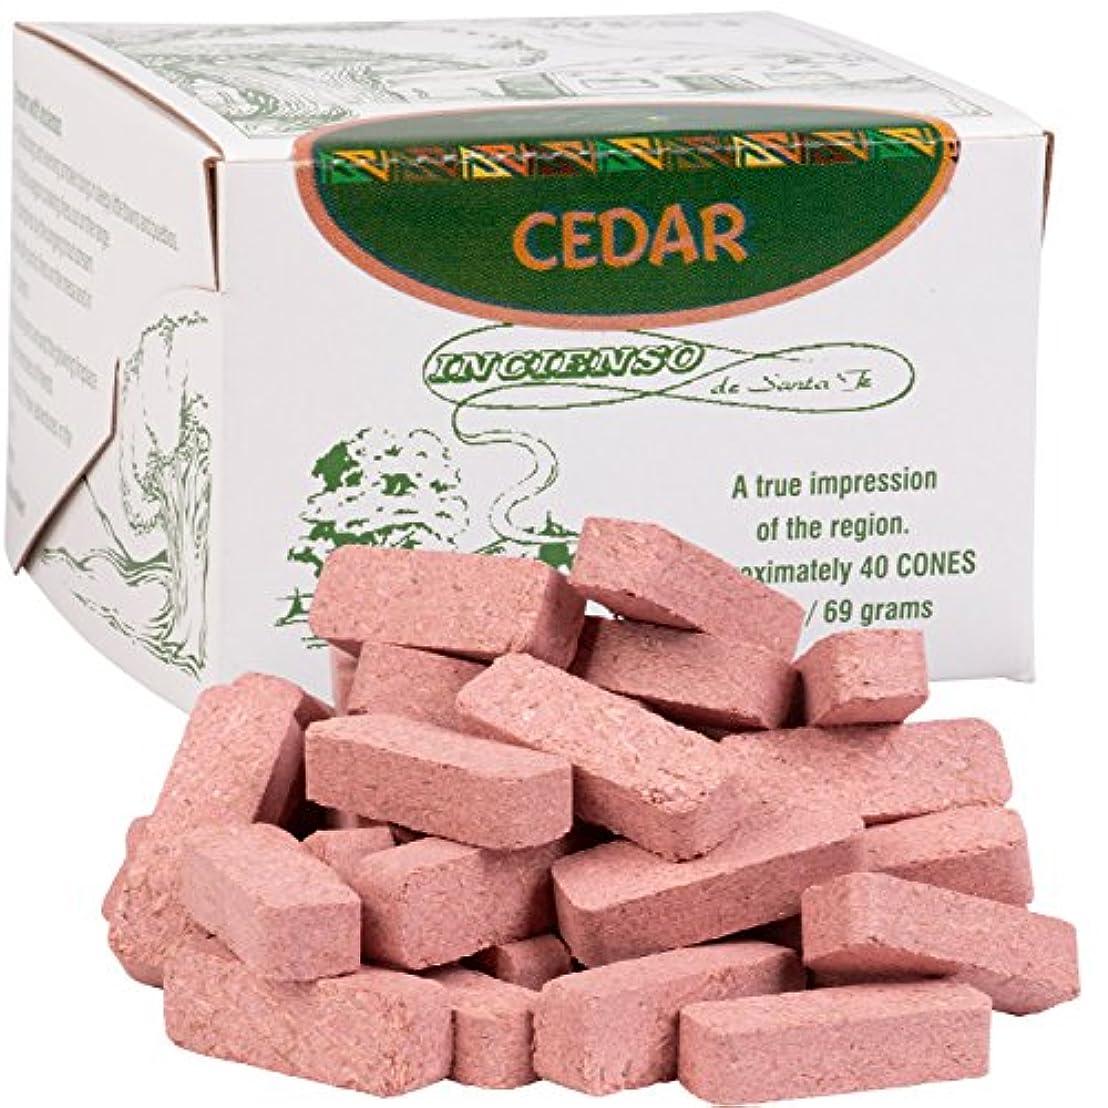 課税失速充電(40 Brick) - Cedar Wood Incense - 80 Bricks (Cones) by Incienso De Santa Fe